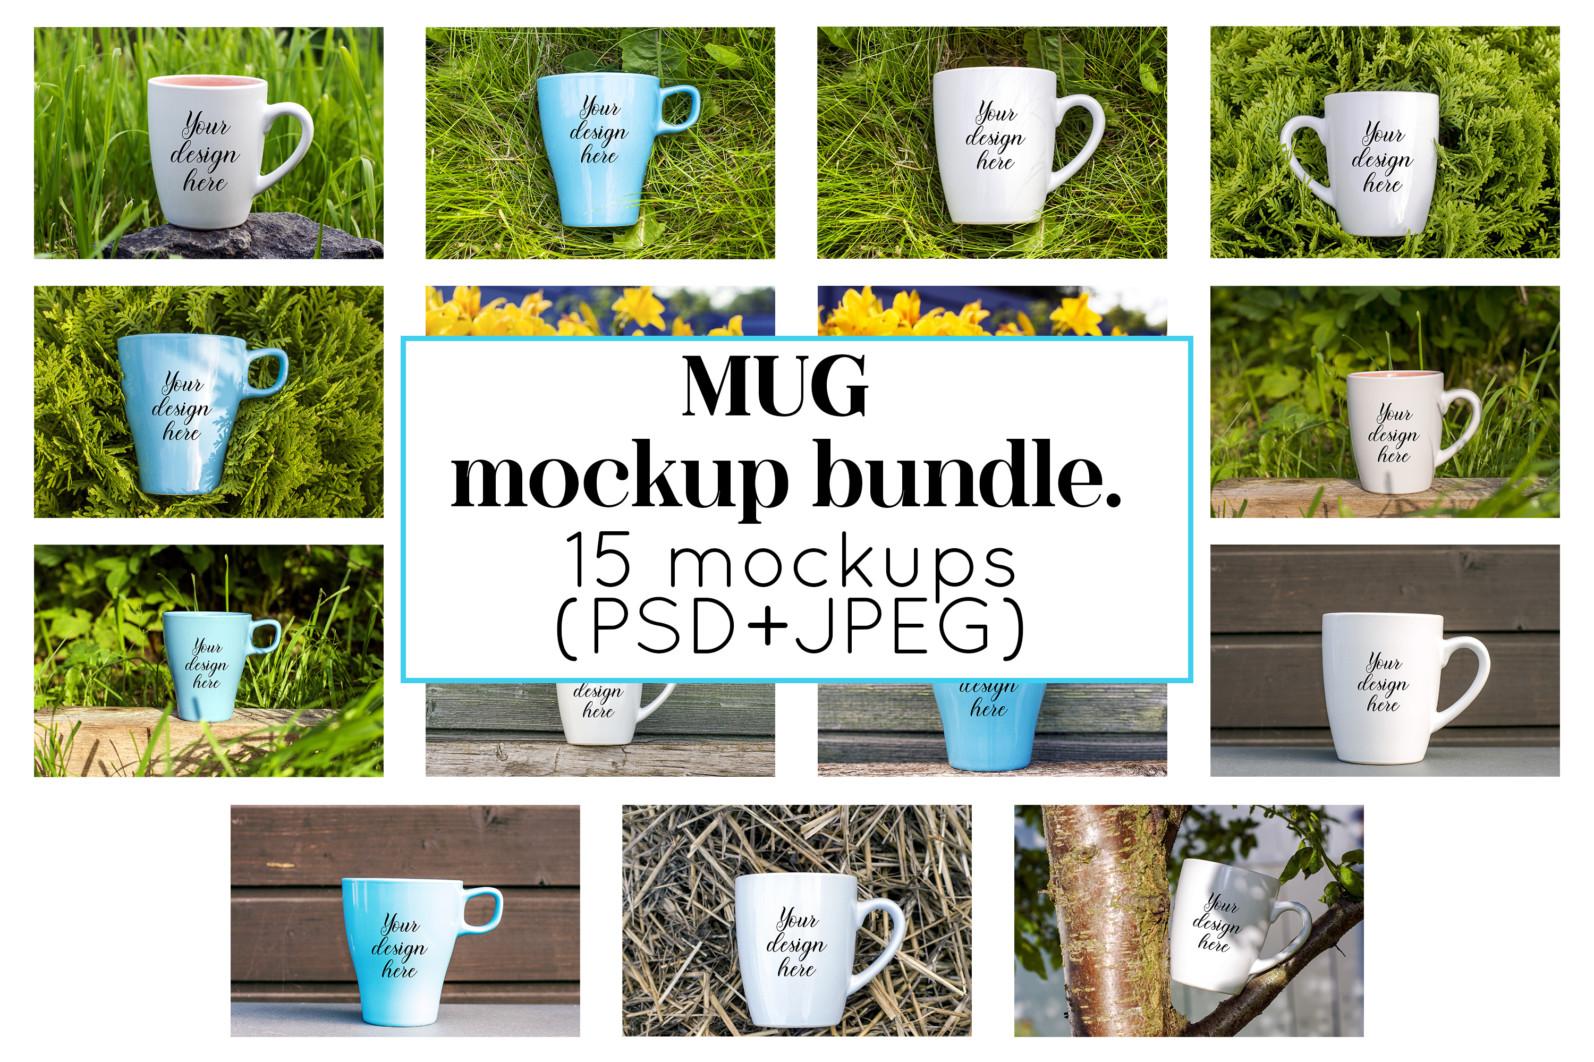 Coffee mug mockup bundle. Mug template bundle. PSD, JPEG files. - 16 42 scaled -